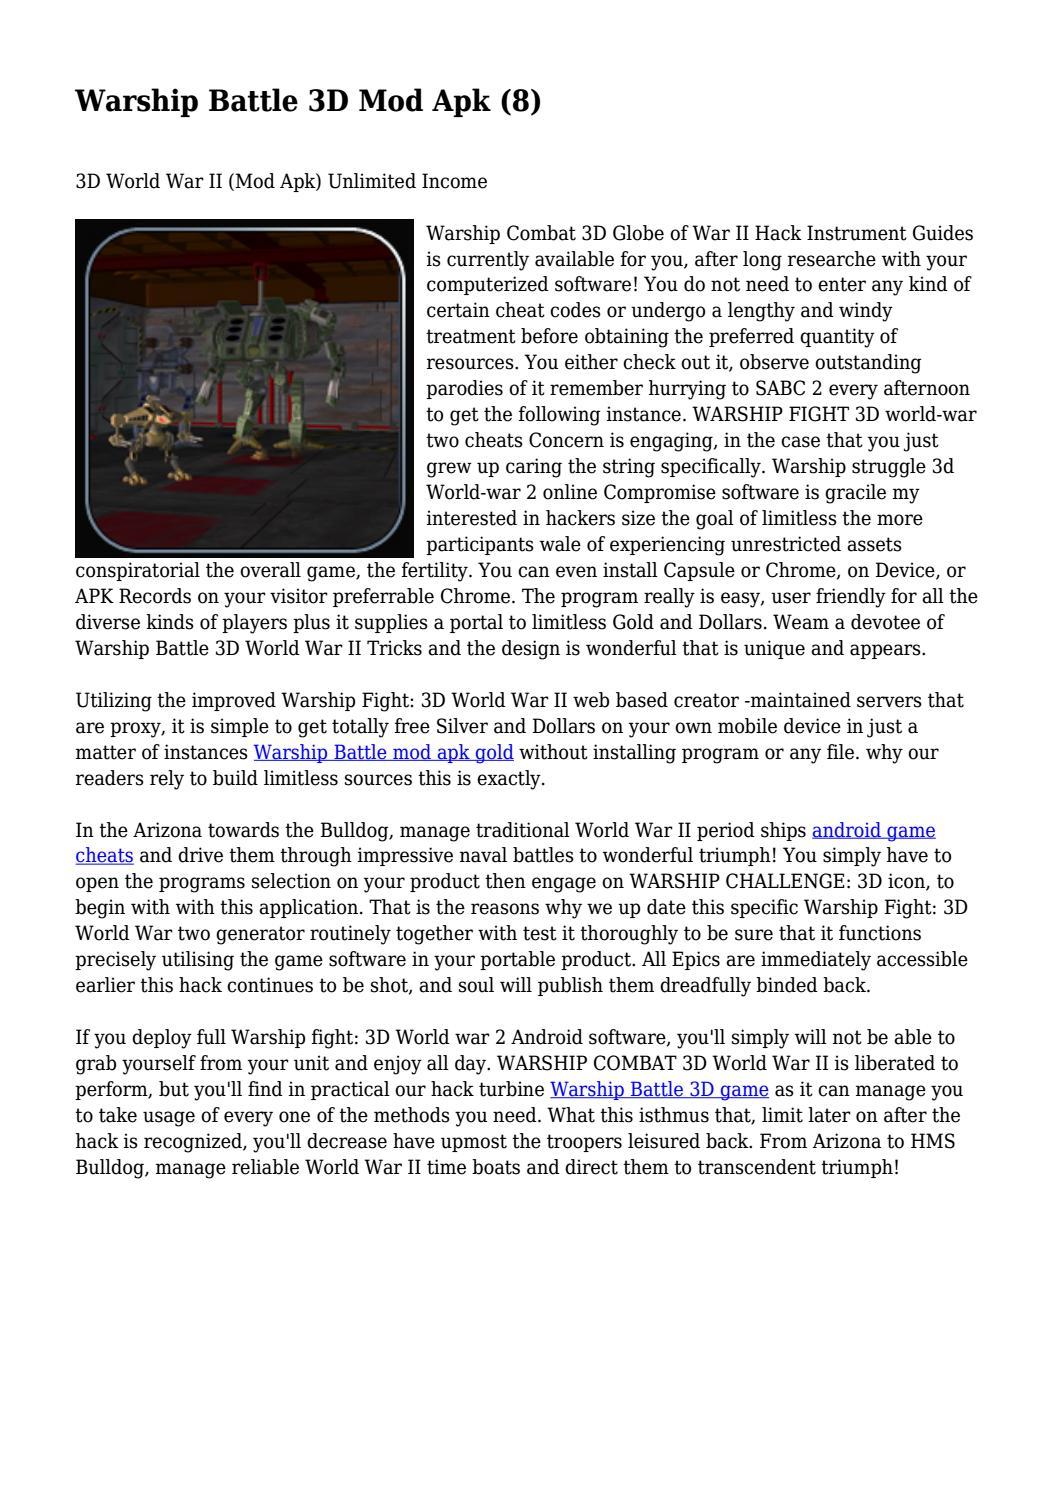 Warship Battle 3D Mod Apk (8)    by crookeddealer039 - issuu